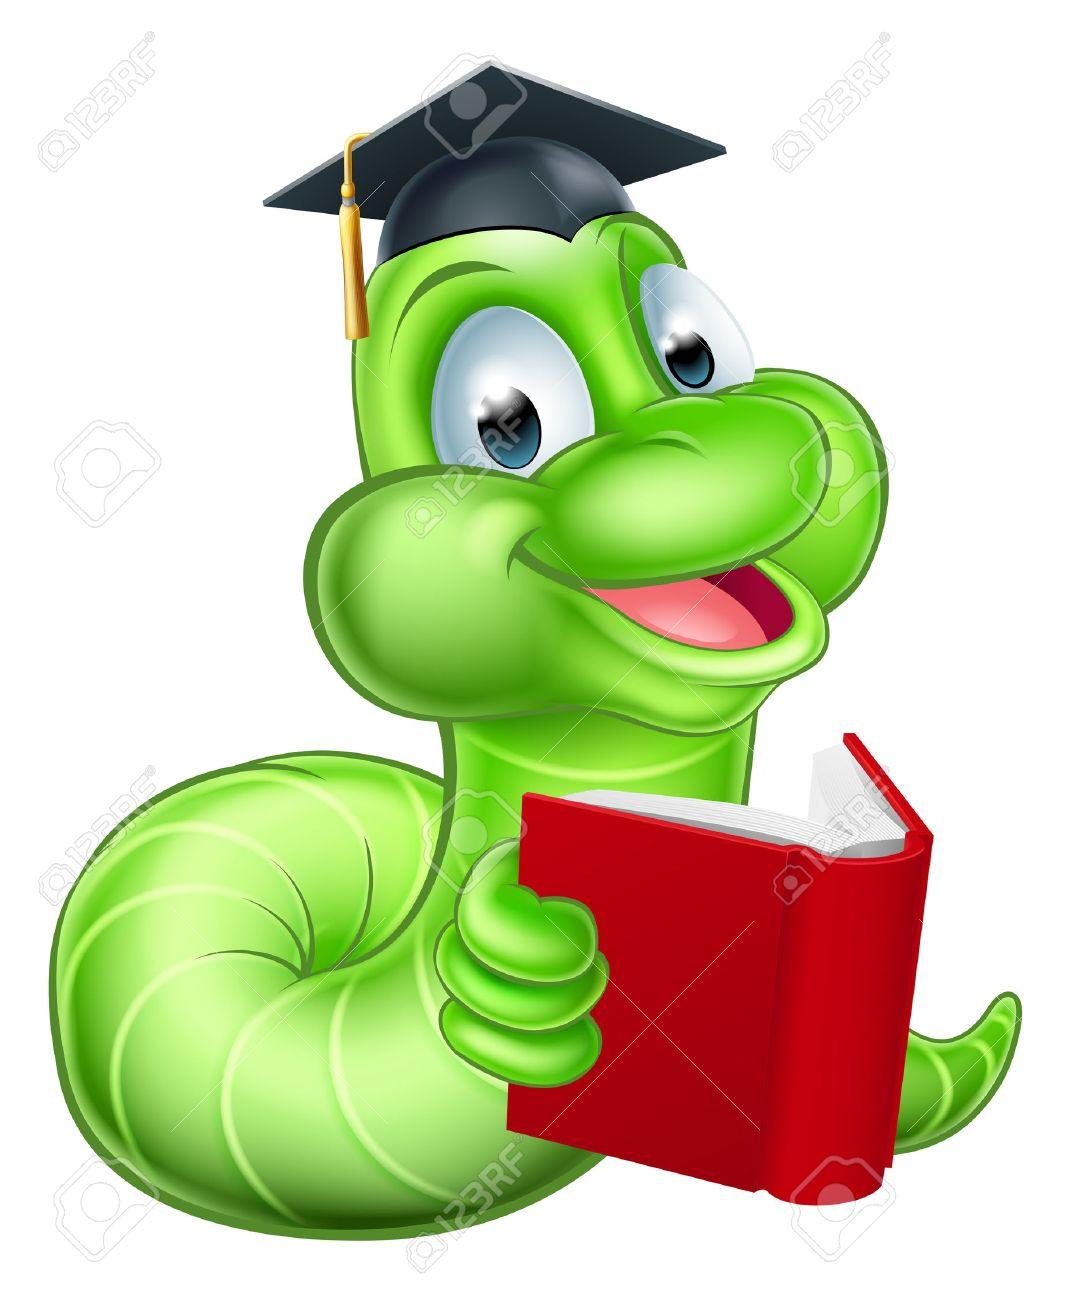 Cute smiling green cartoon caterpillar worm bookworm mascot reading...